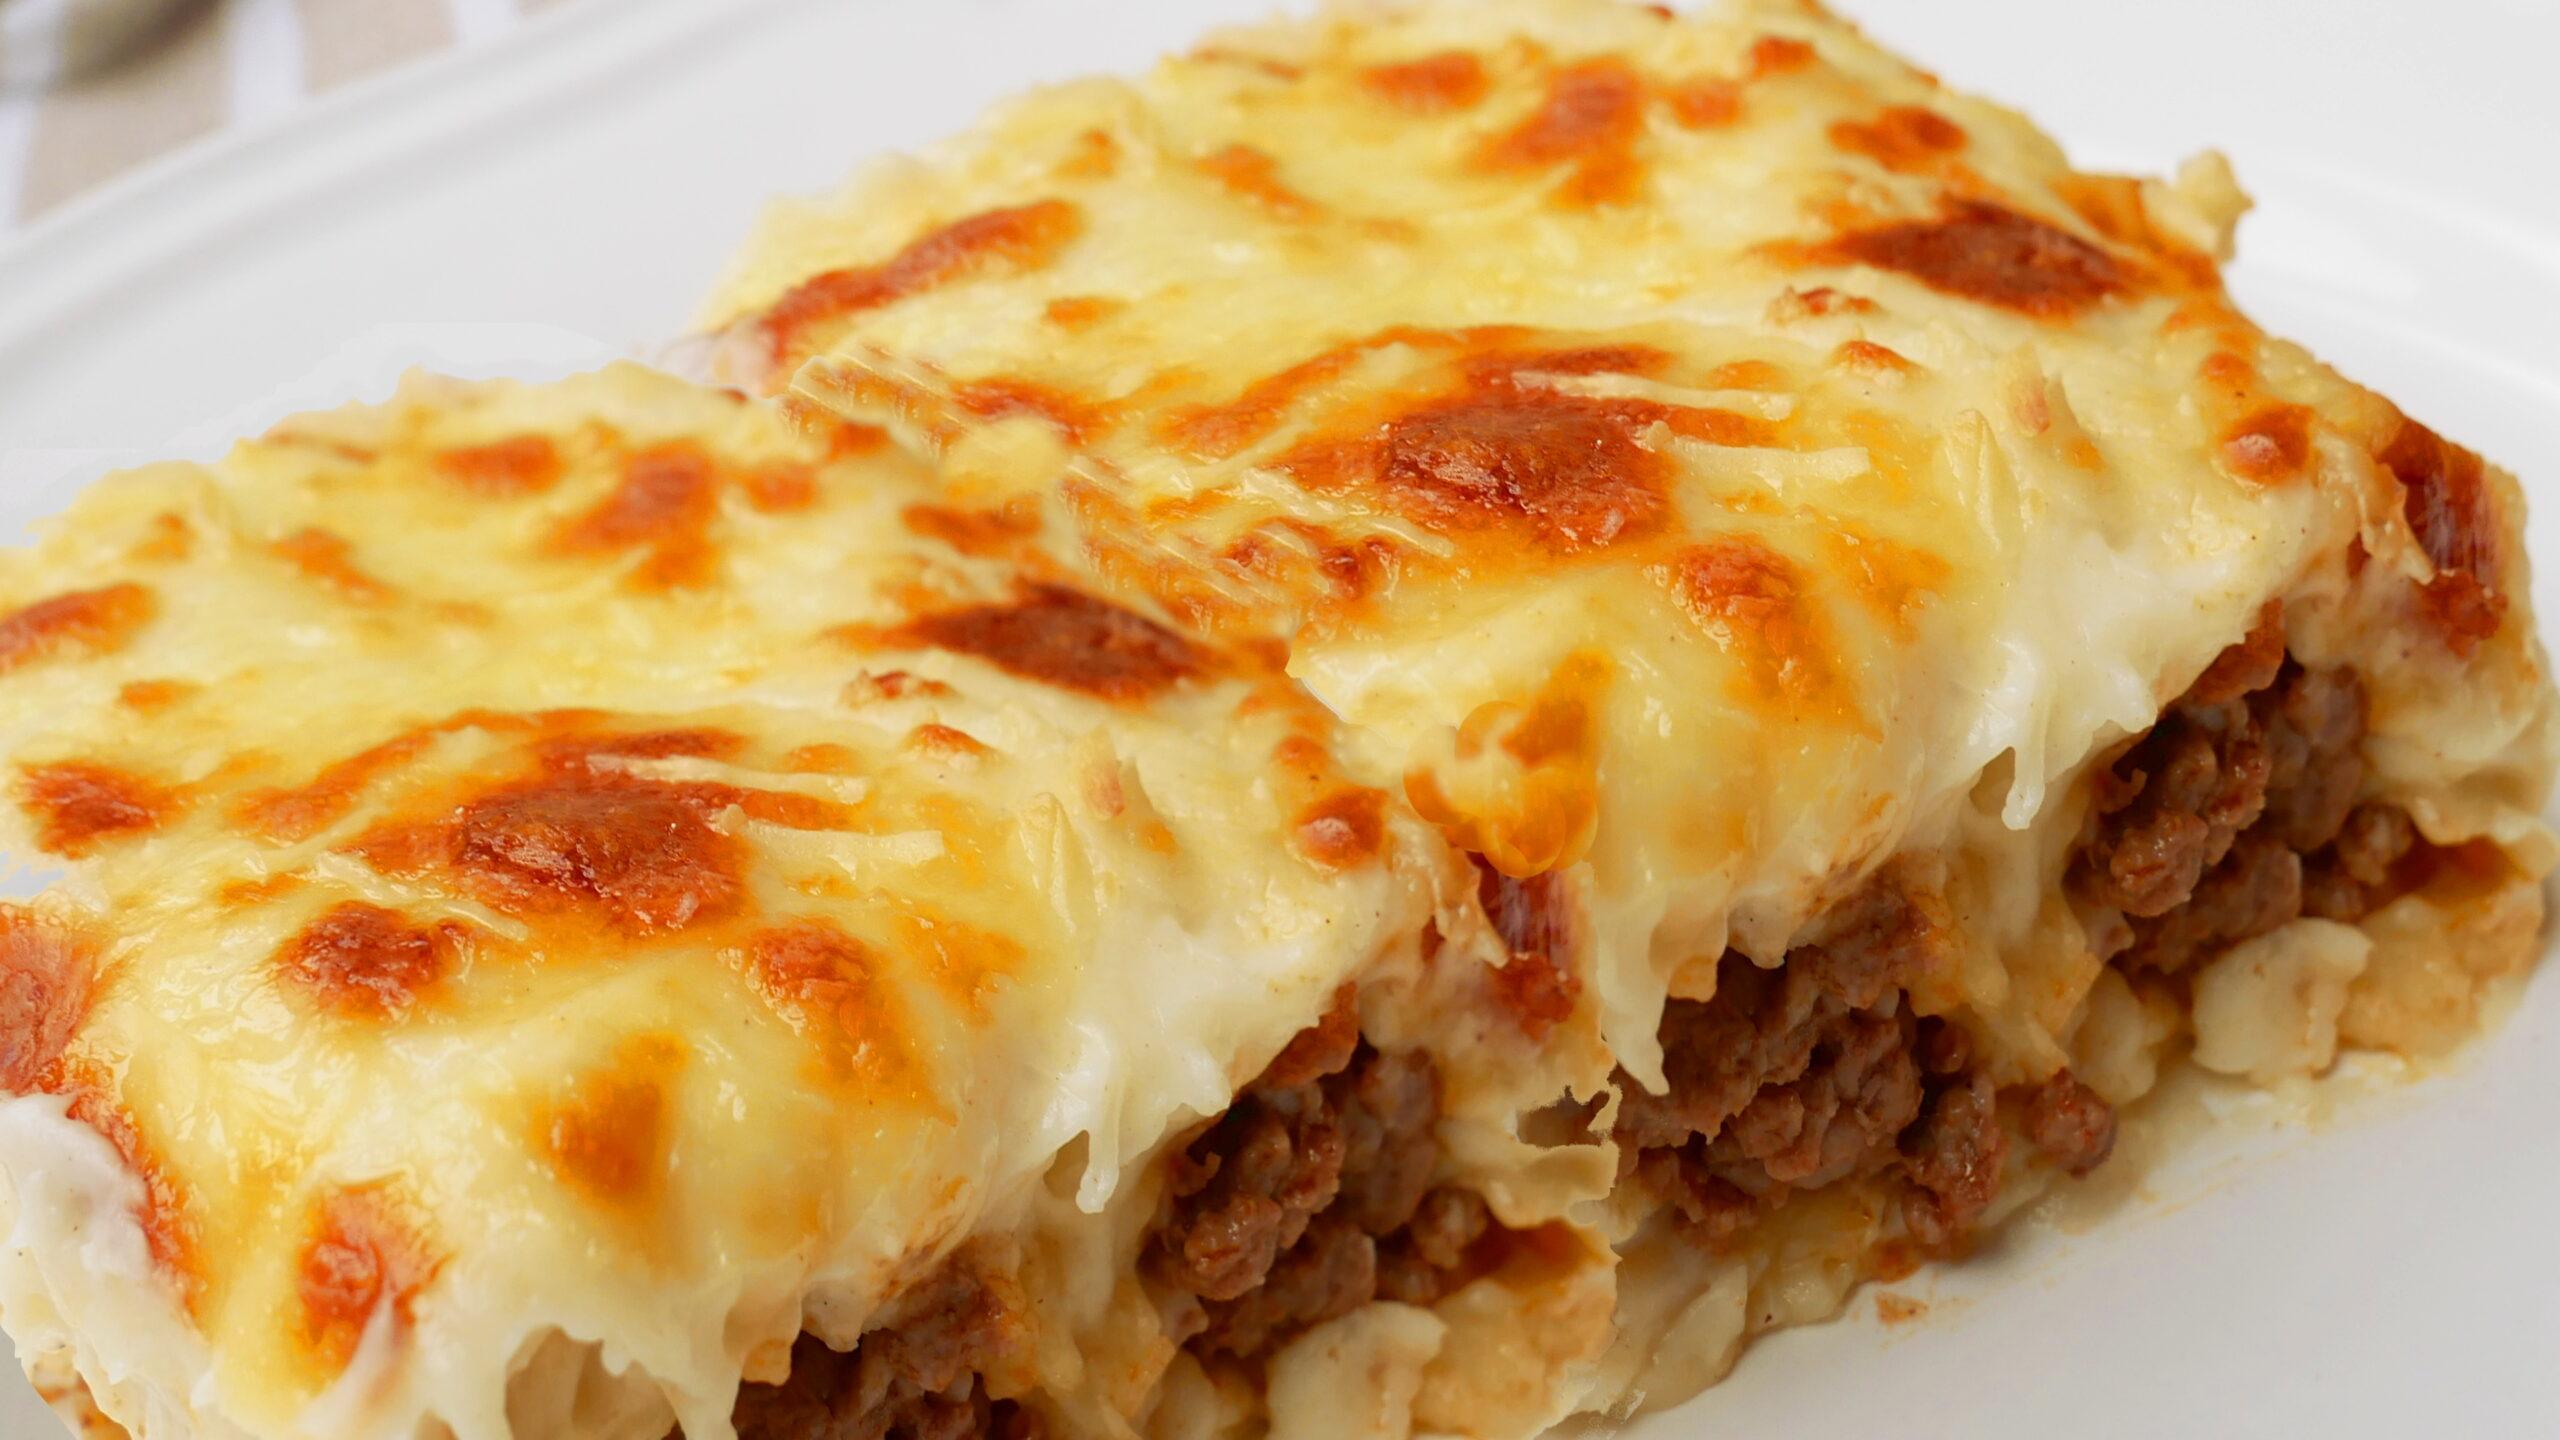 canelones_carne_picada_vueltayvueltacarne.es